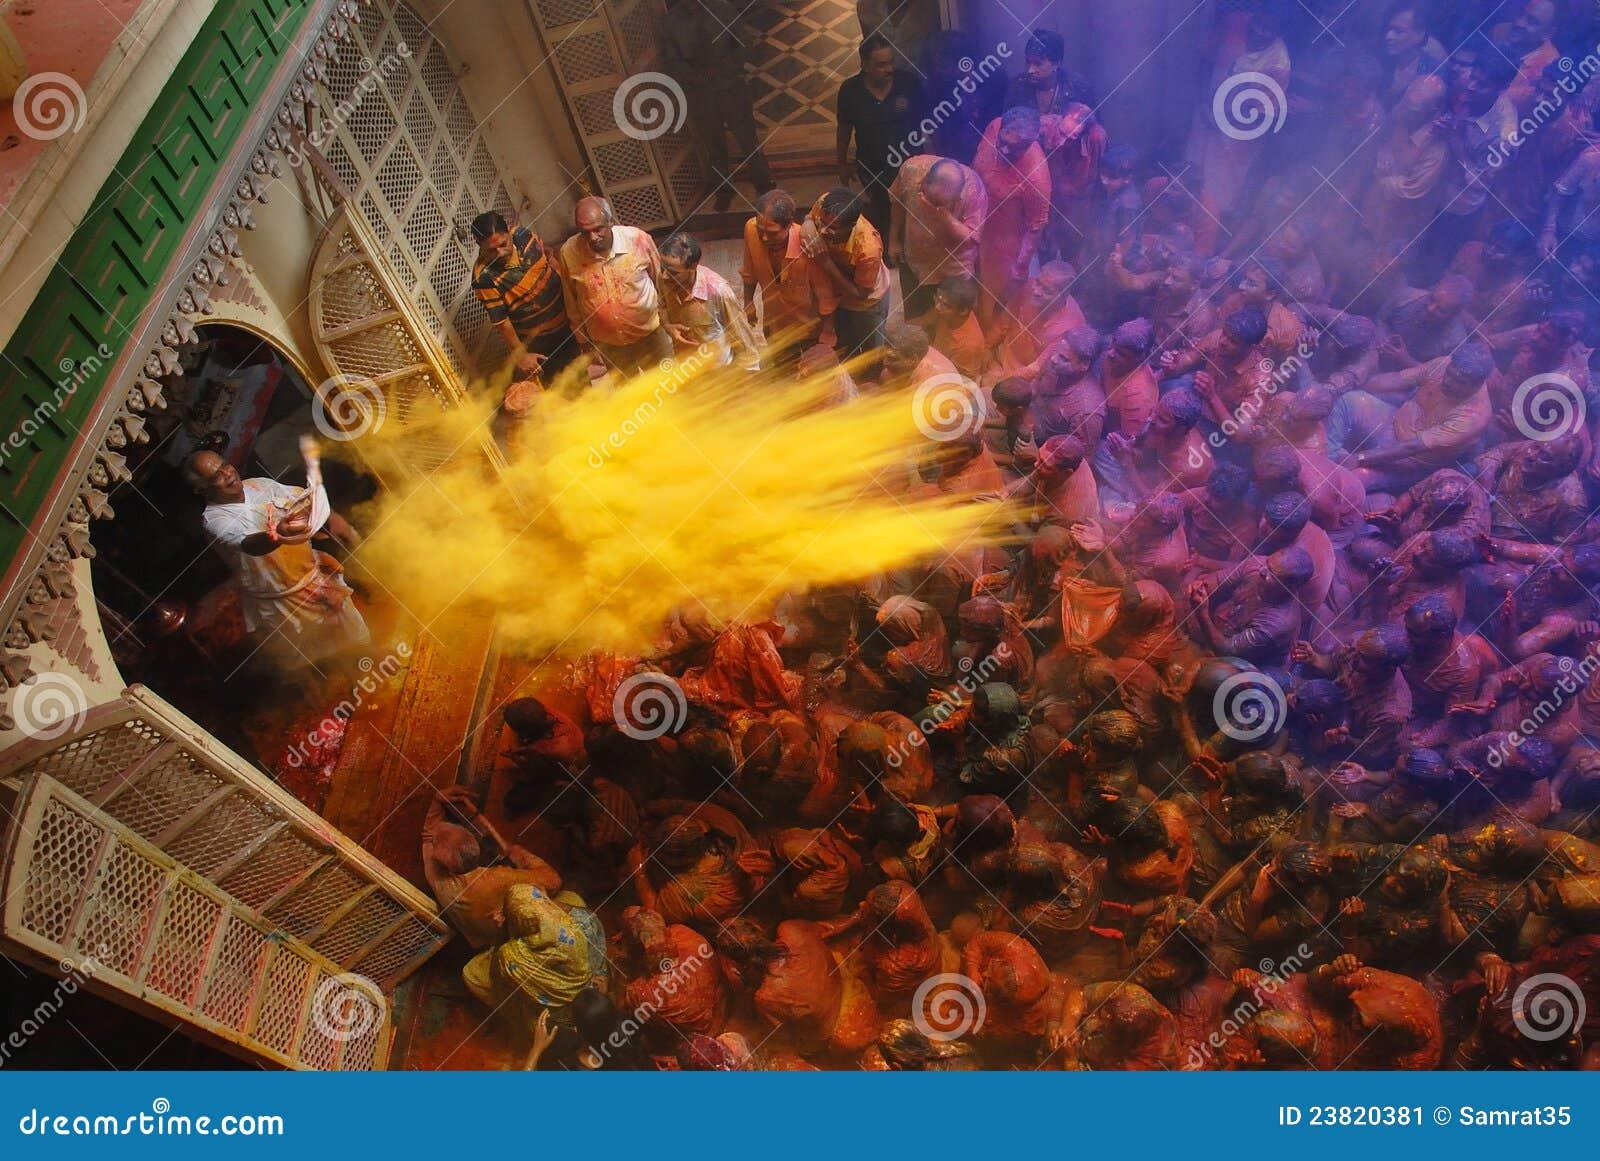 Festival de Holi en Inde